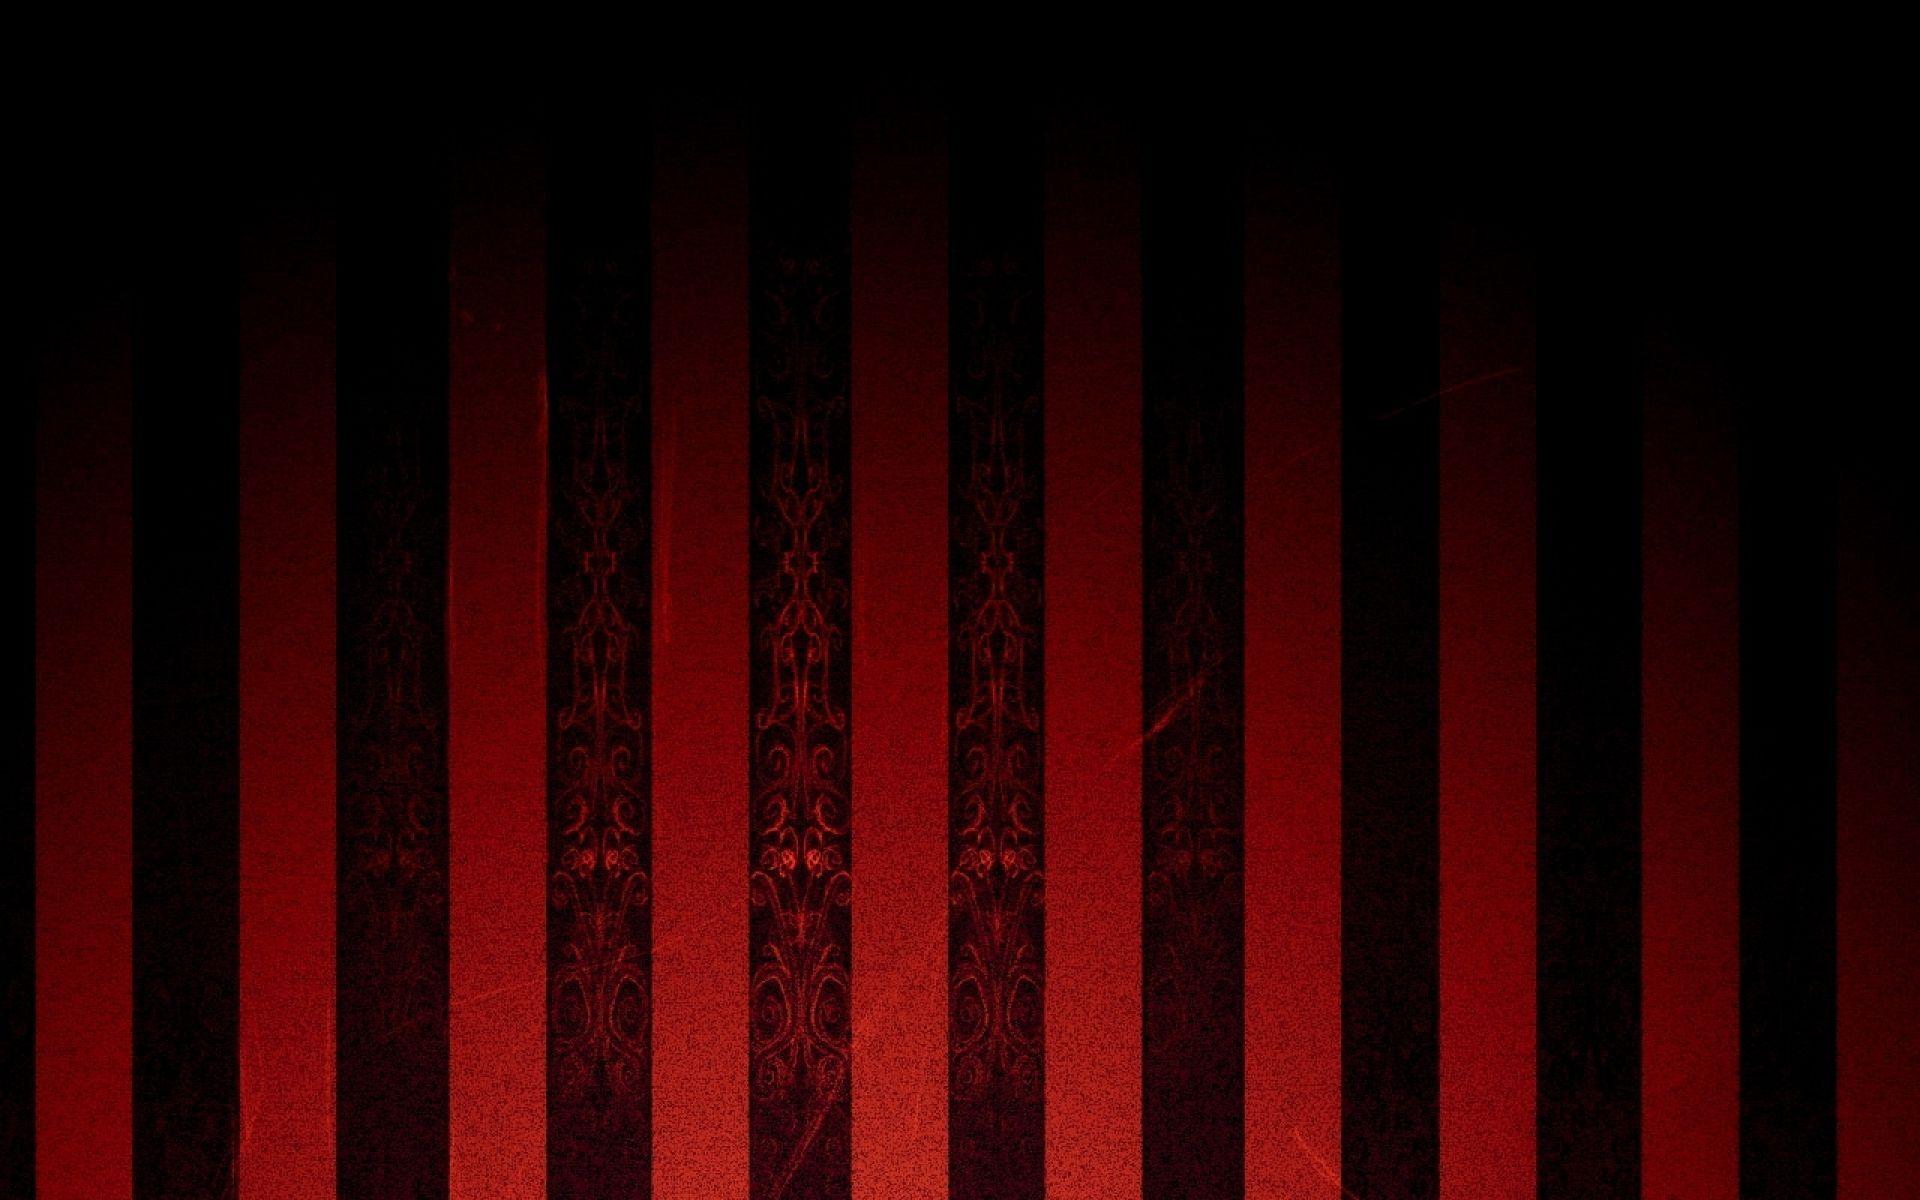 Download 5000 Wallpaper Hd Black Red HD Paling Keren